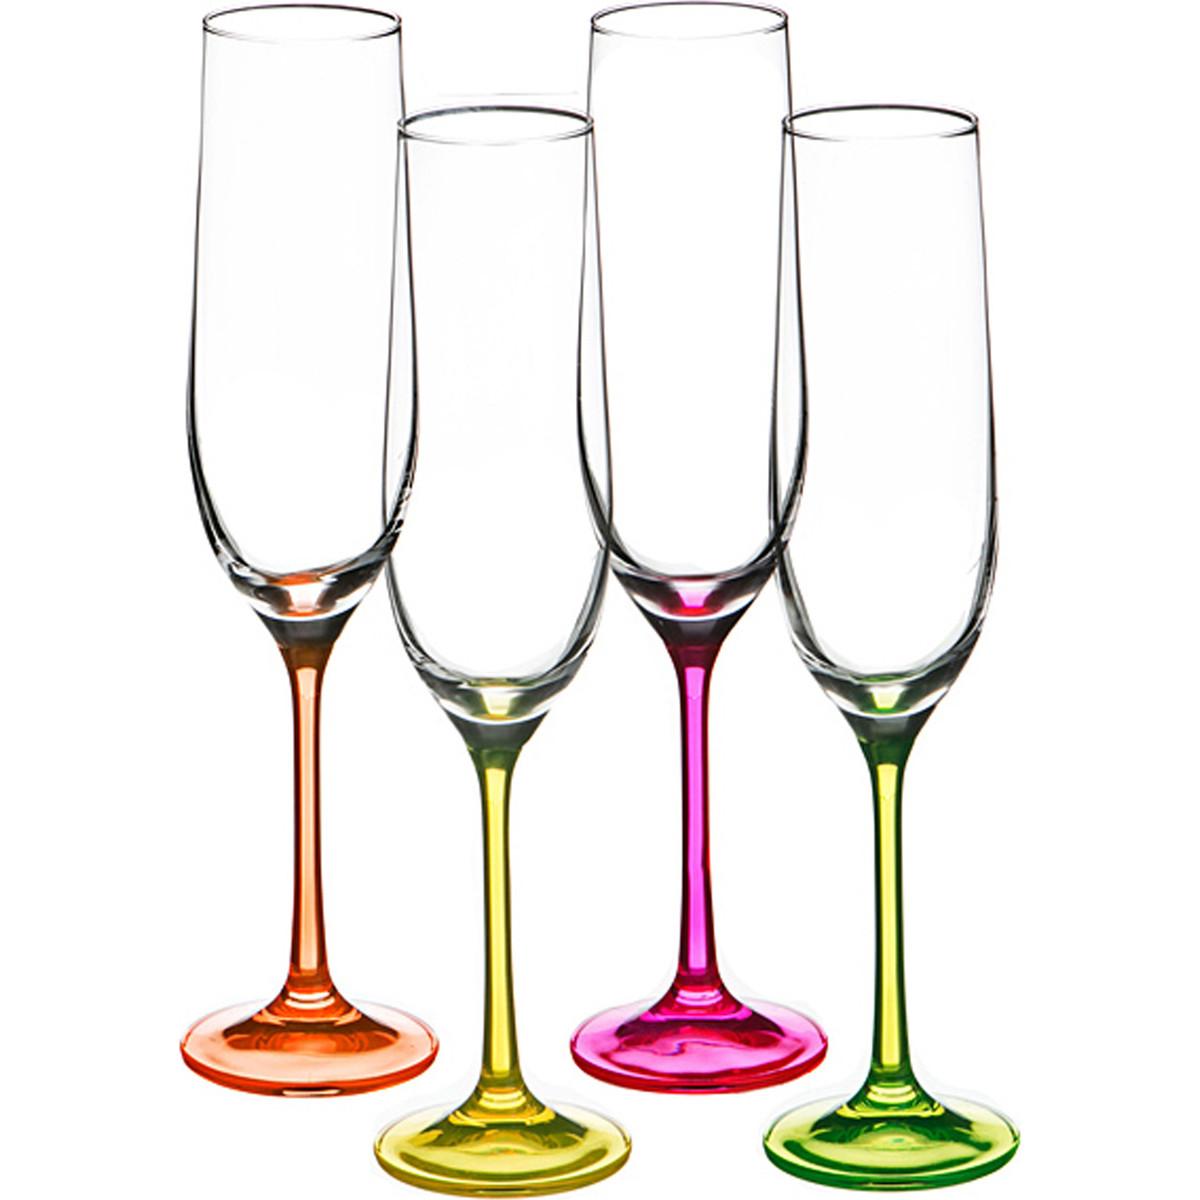 {} Bohemia Crystal Набор бокалов для шампанского Cedar (24 см - 4 шт) bohemia crystal набор бокалов для шампанского felina 25 см 2 шт